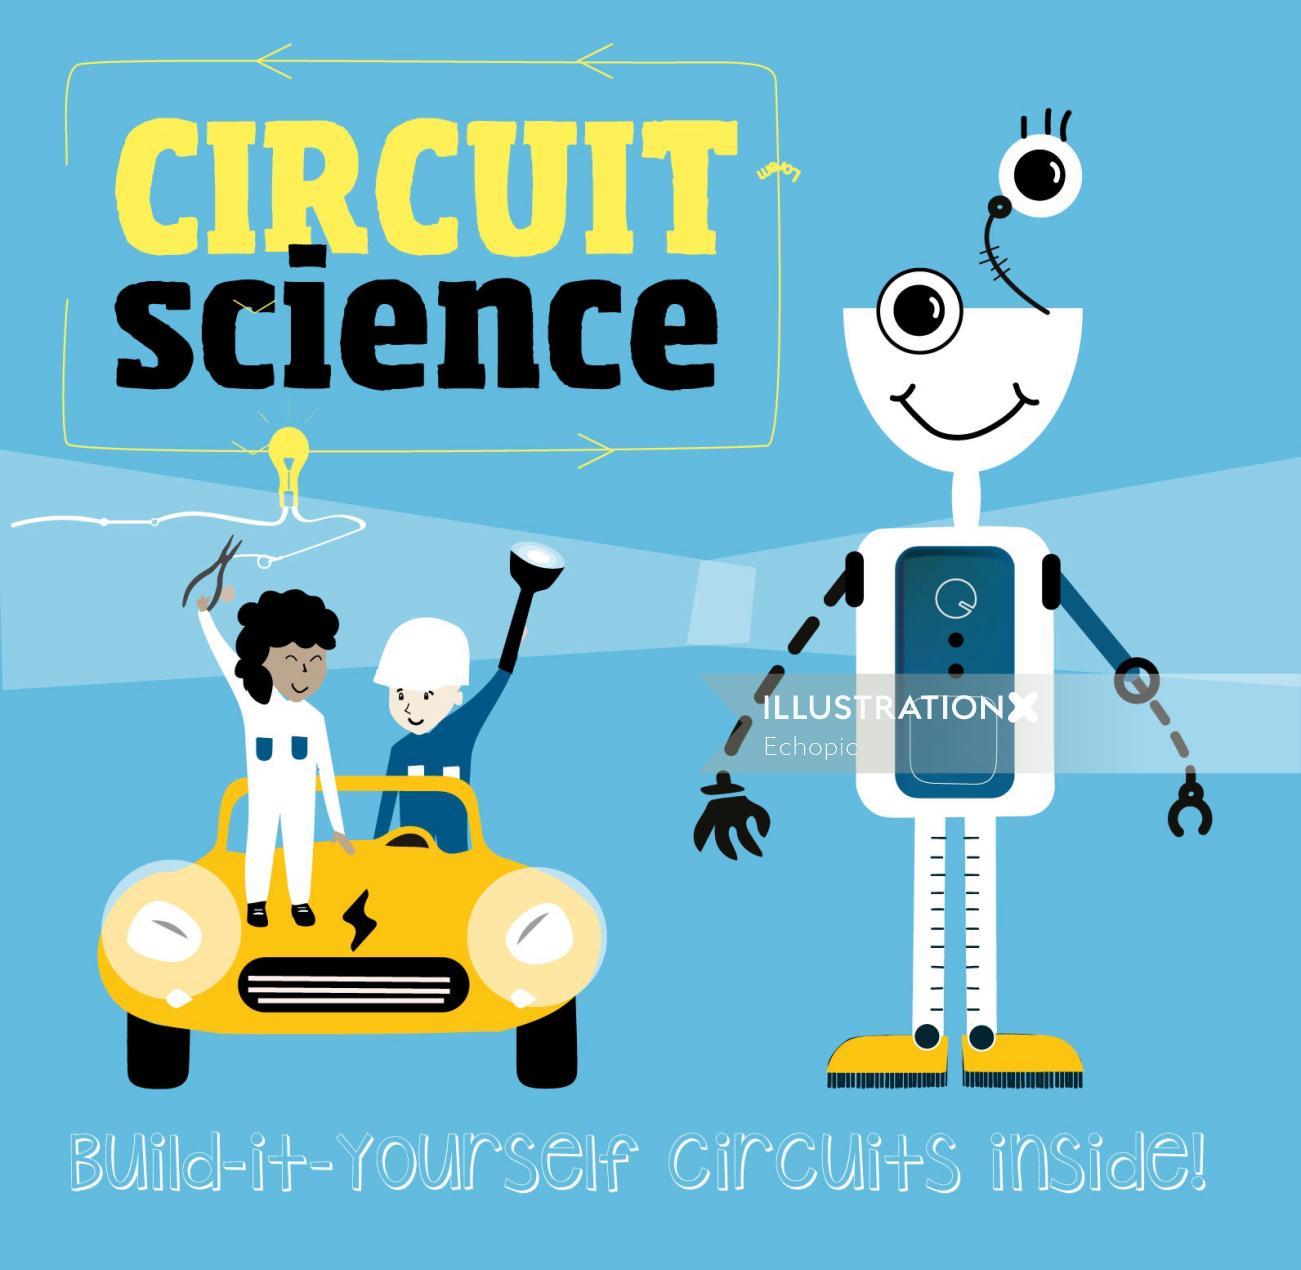 Graphic circuit science